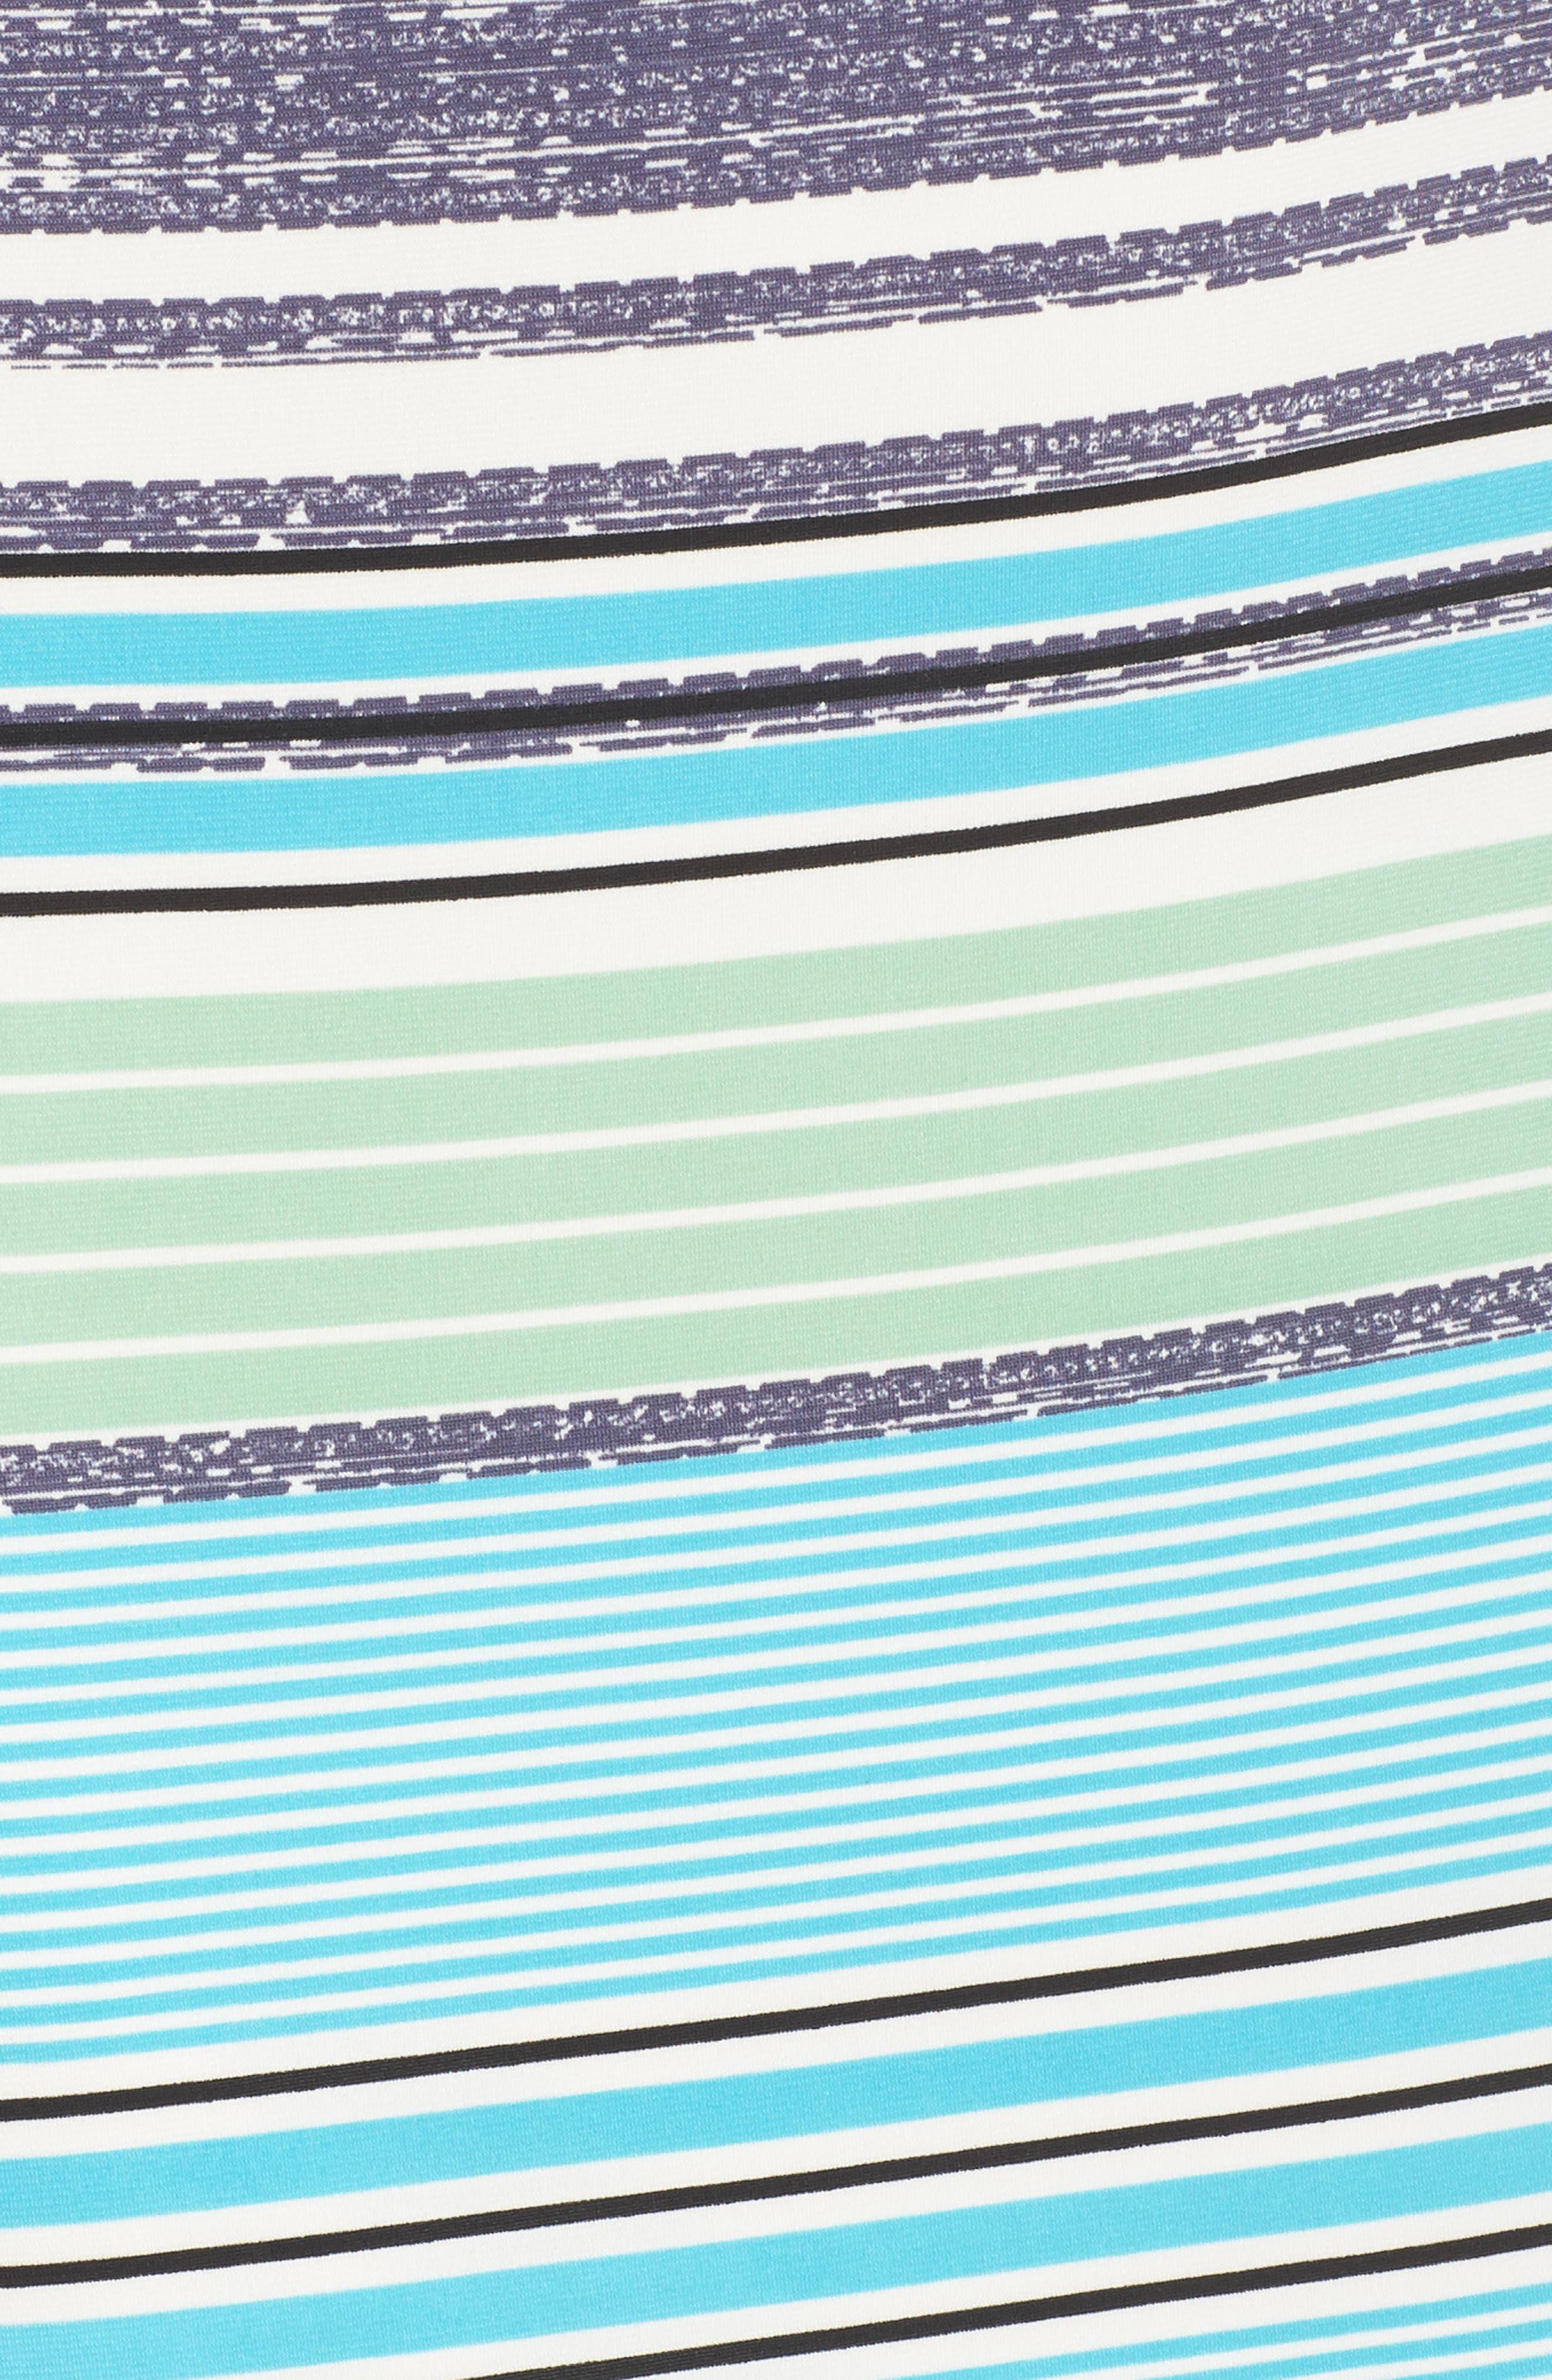 Ruched Sleeve Sheath Dress,                             Alternate thumbnail 6, color,                             White/ Aqua